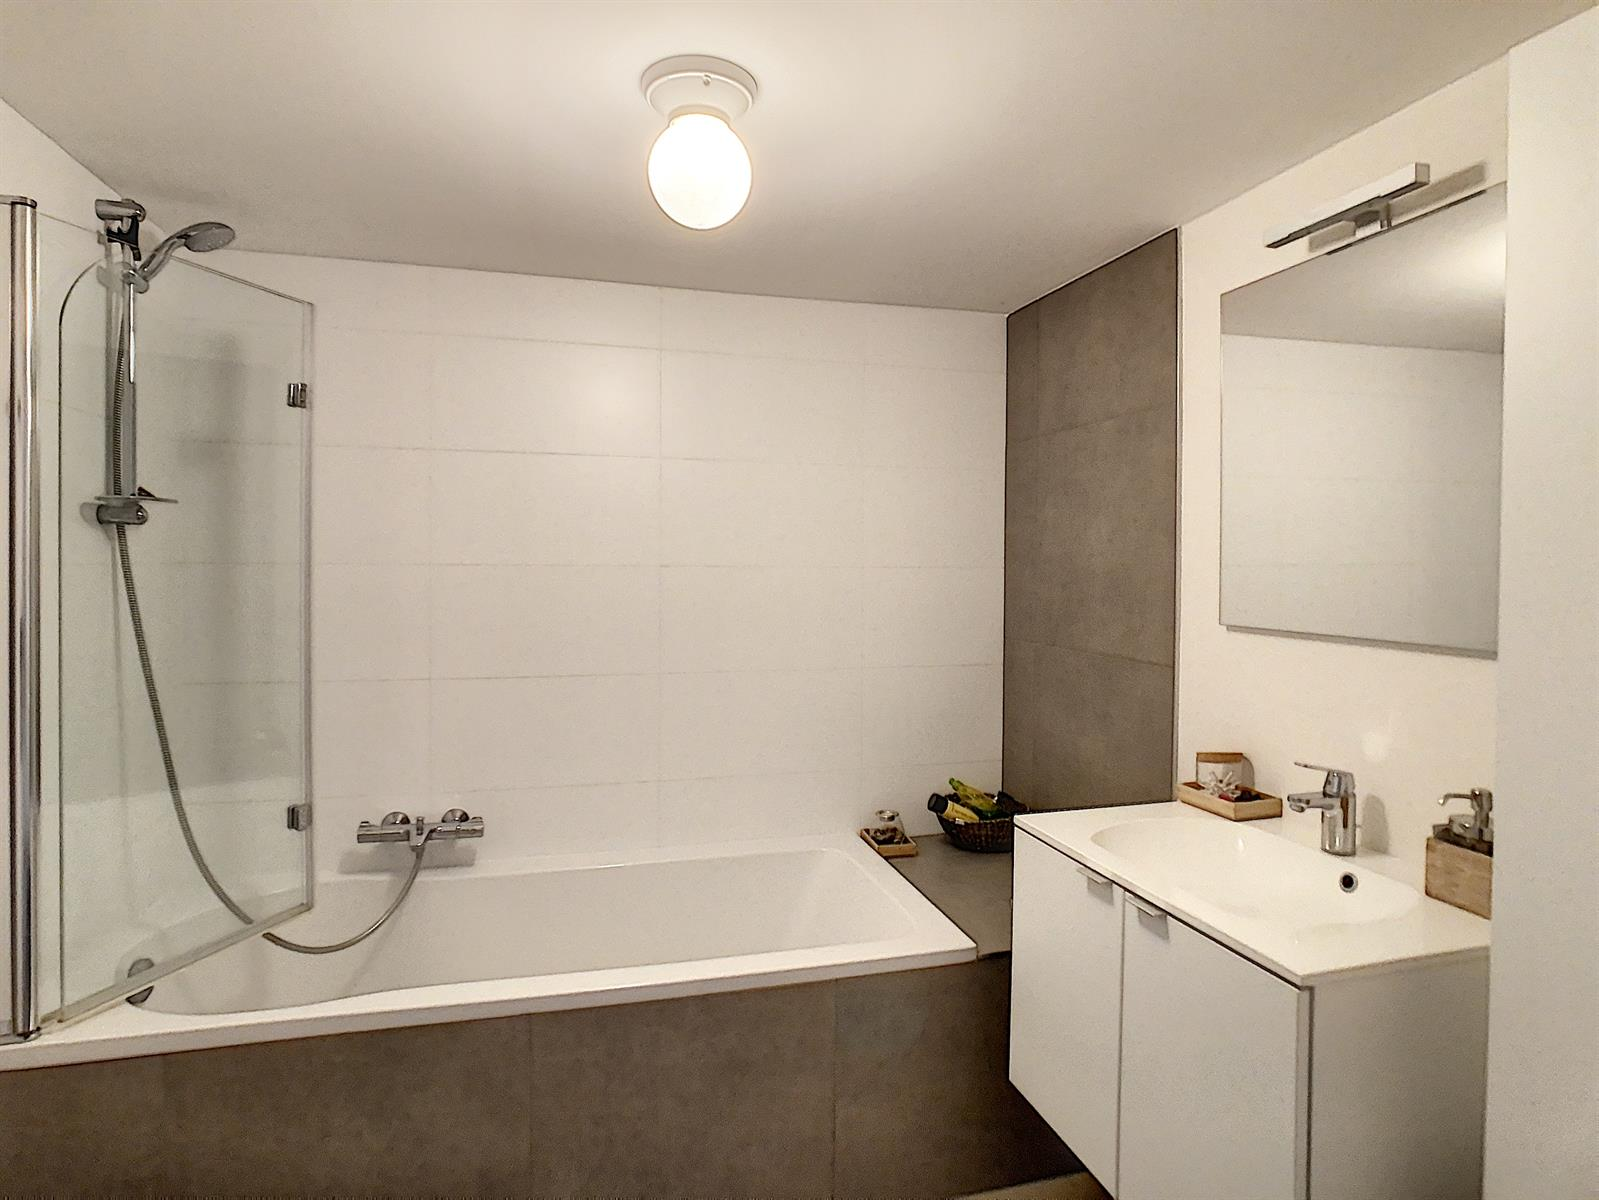 Appartement - Walcourt Laneffe - #4132491-4